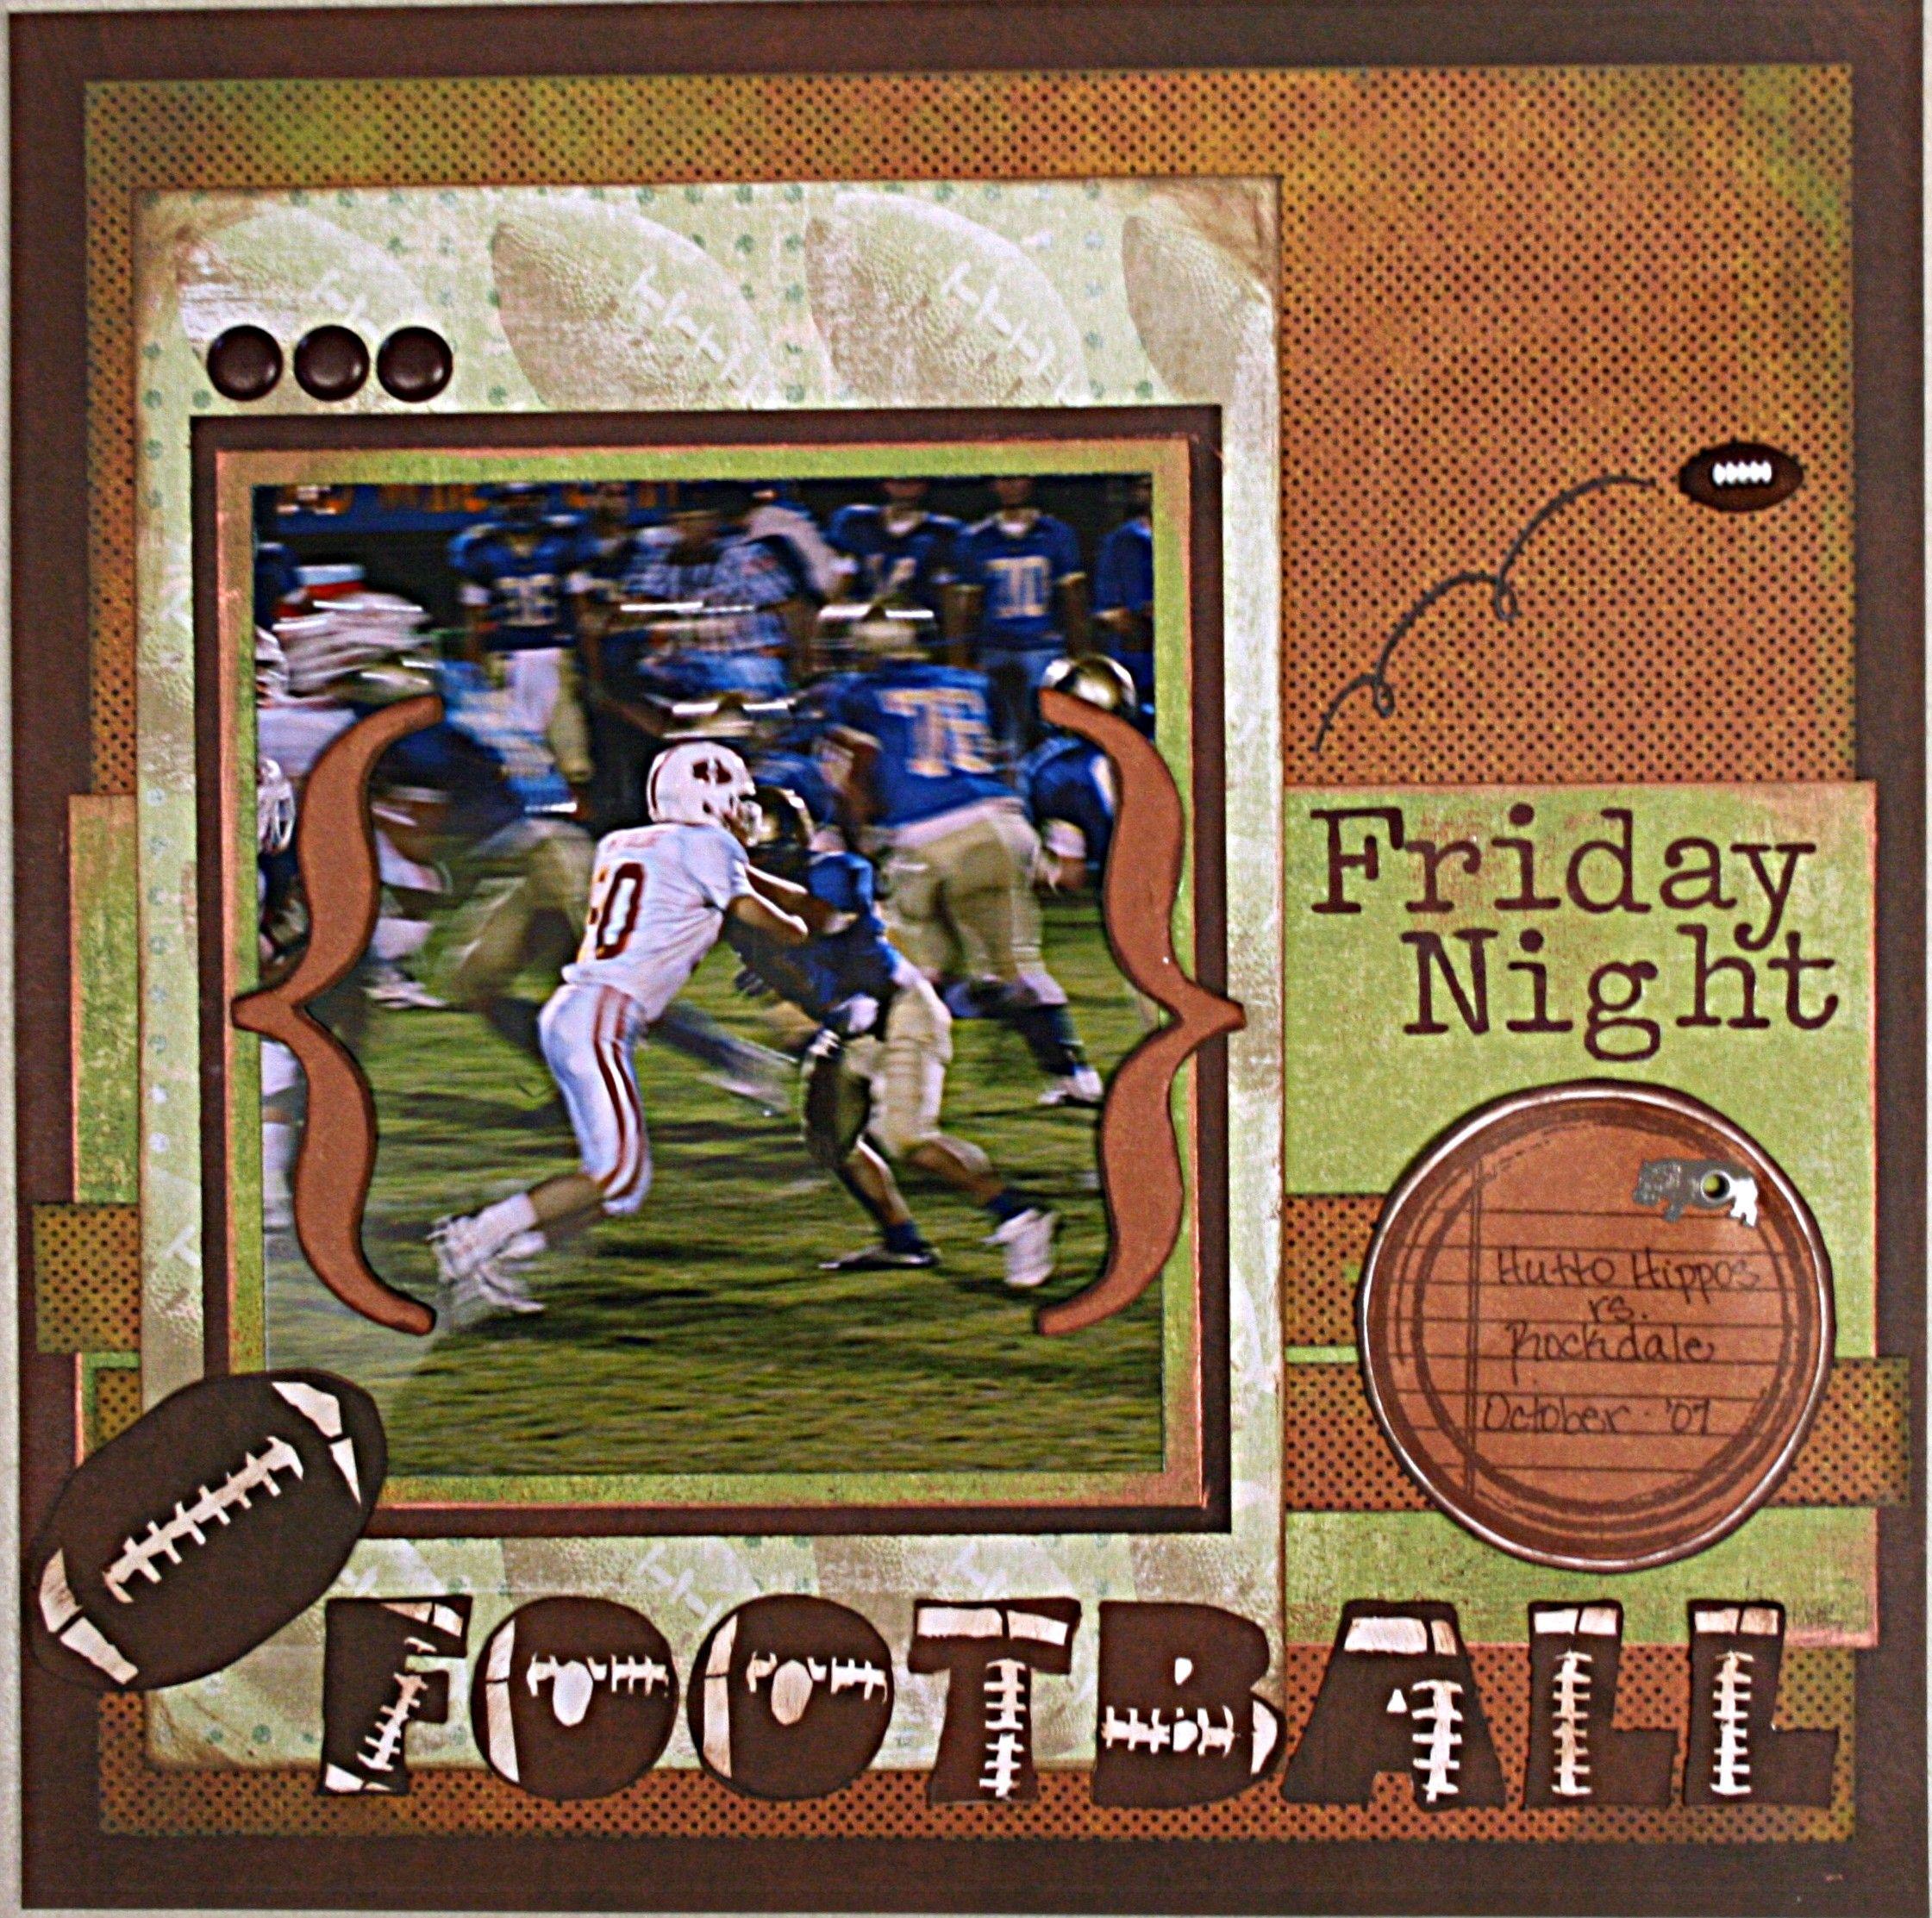 friday night football scrapbook com football scrapbook